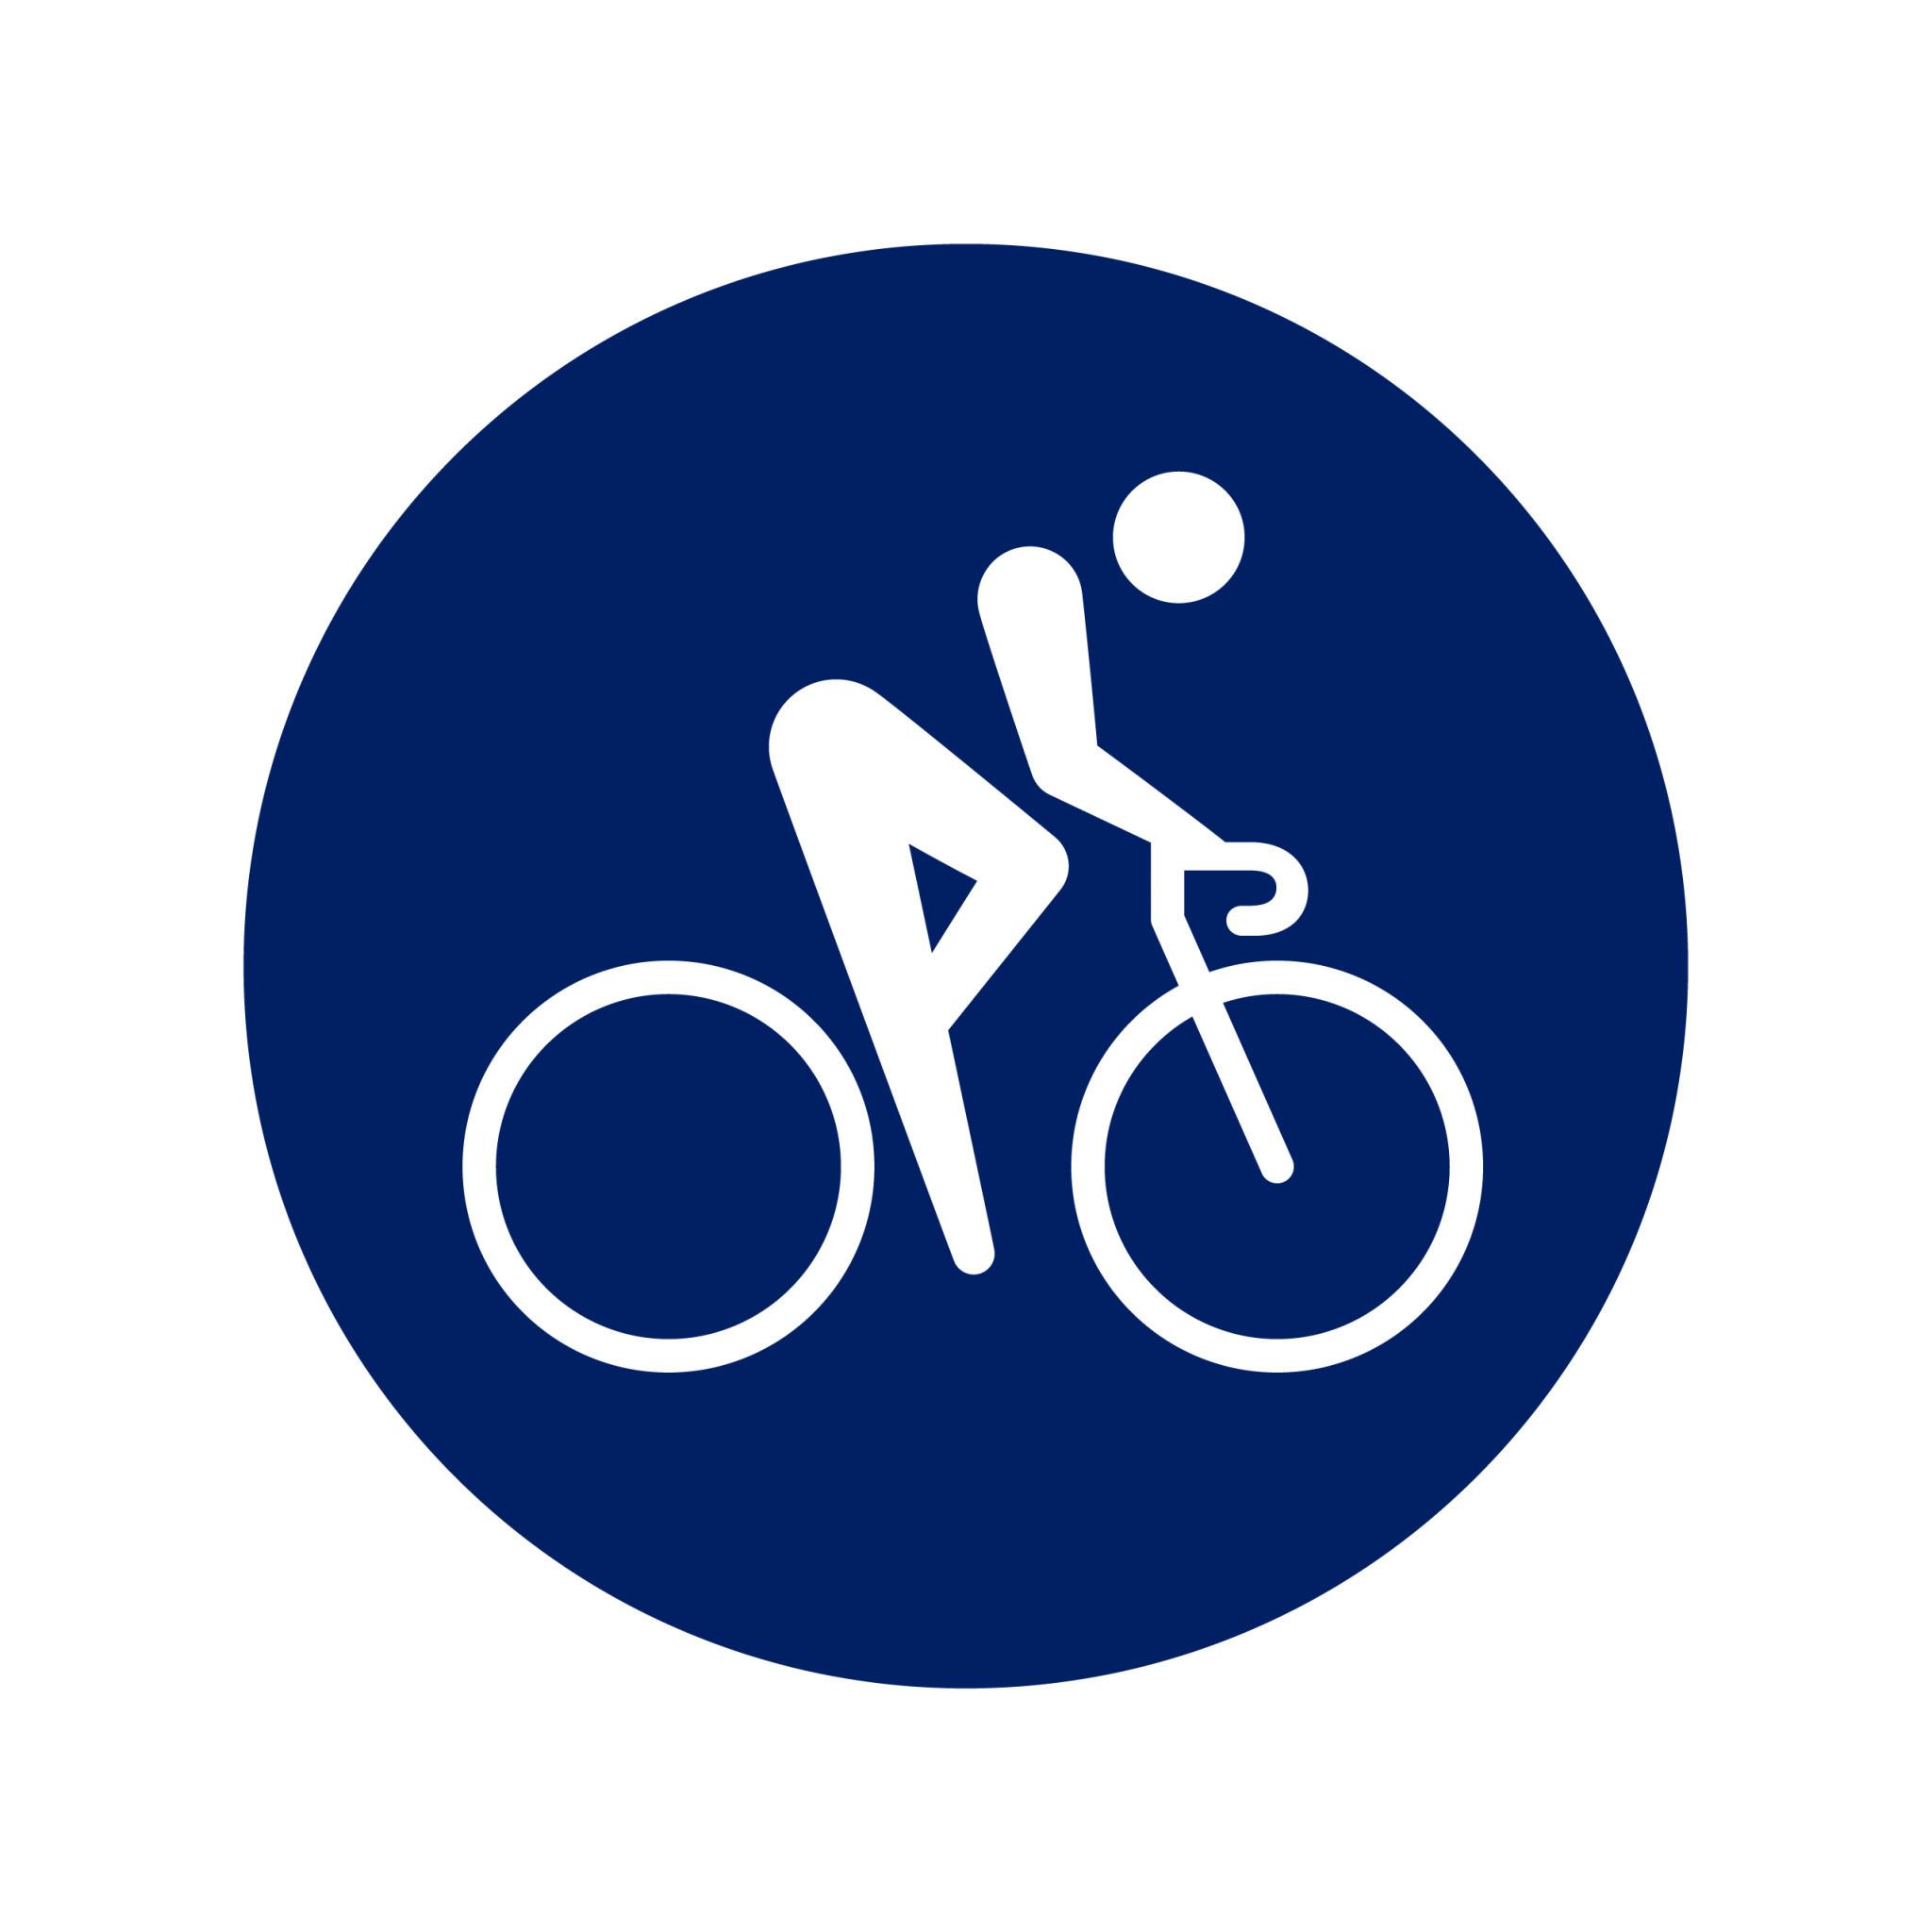 Cycling - road